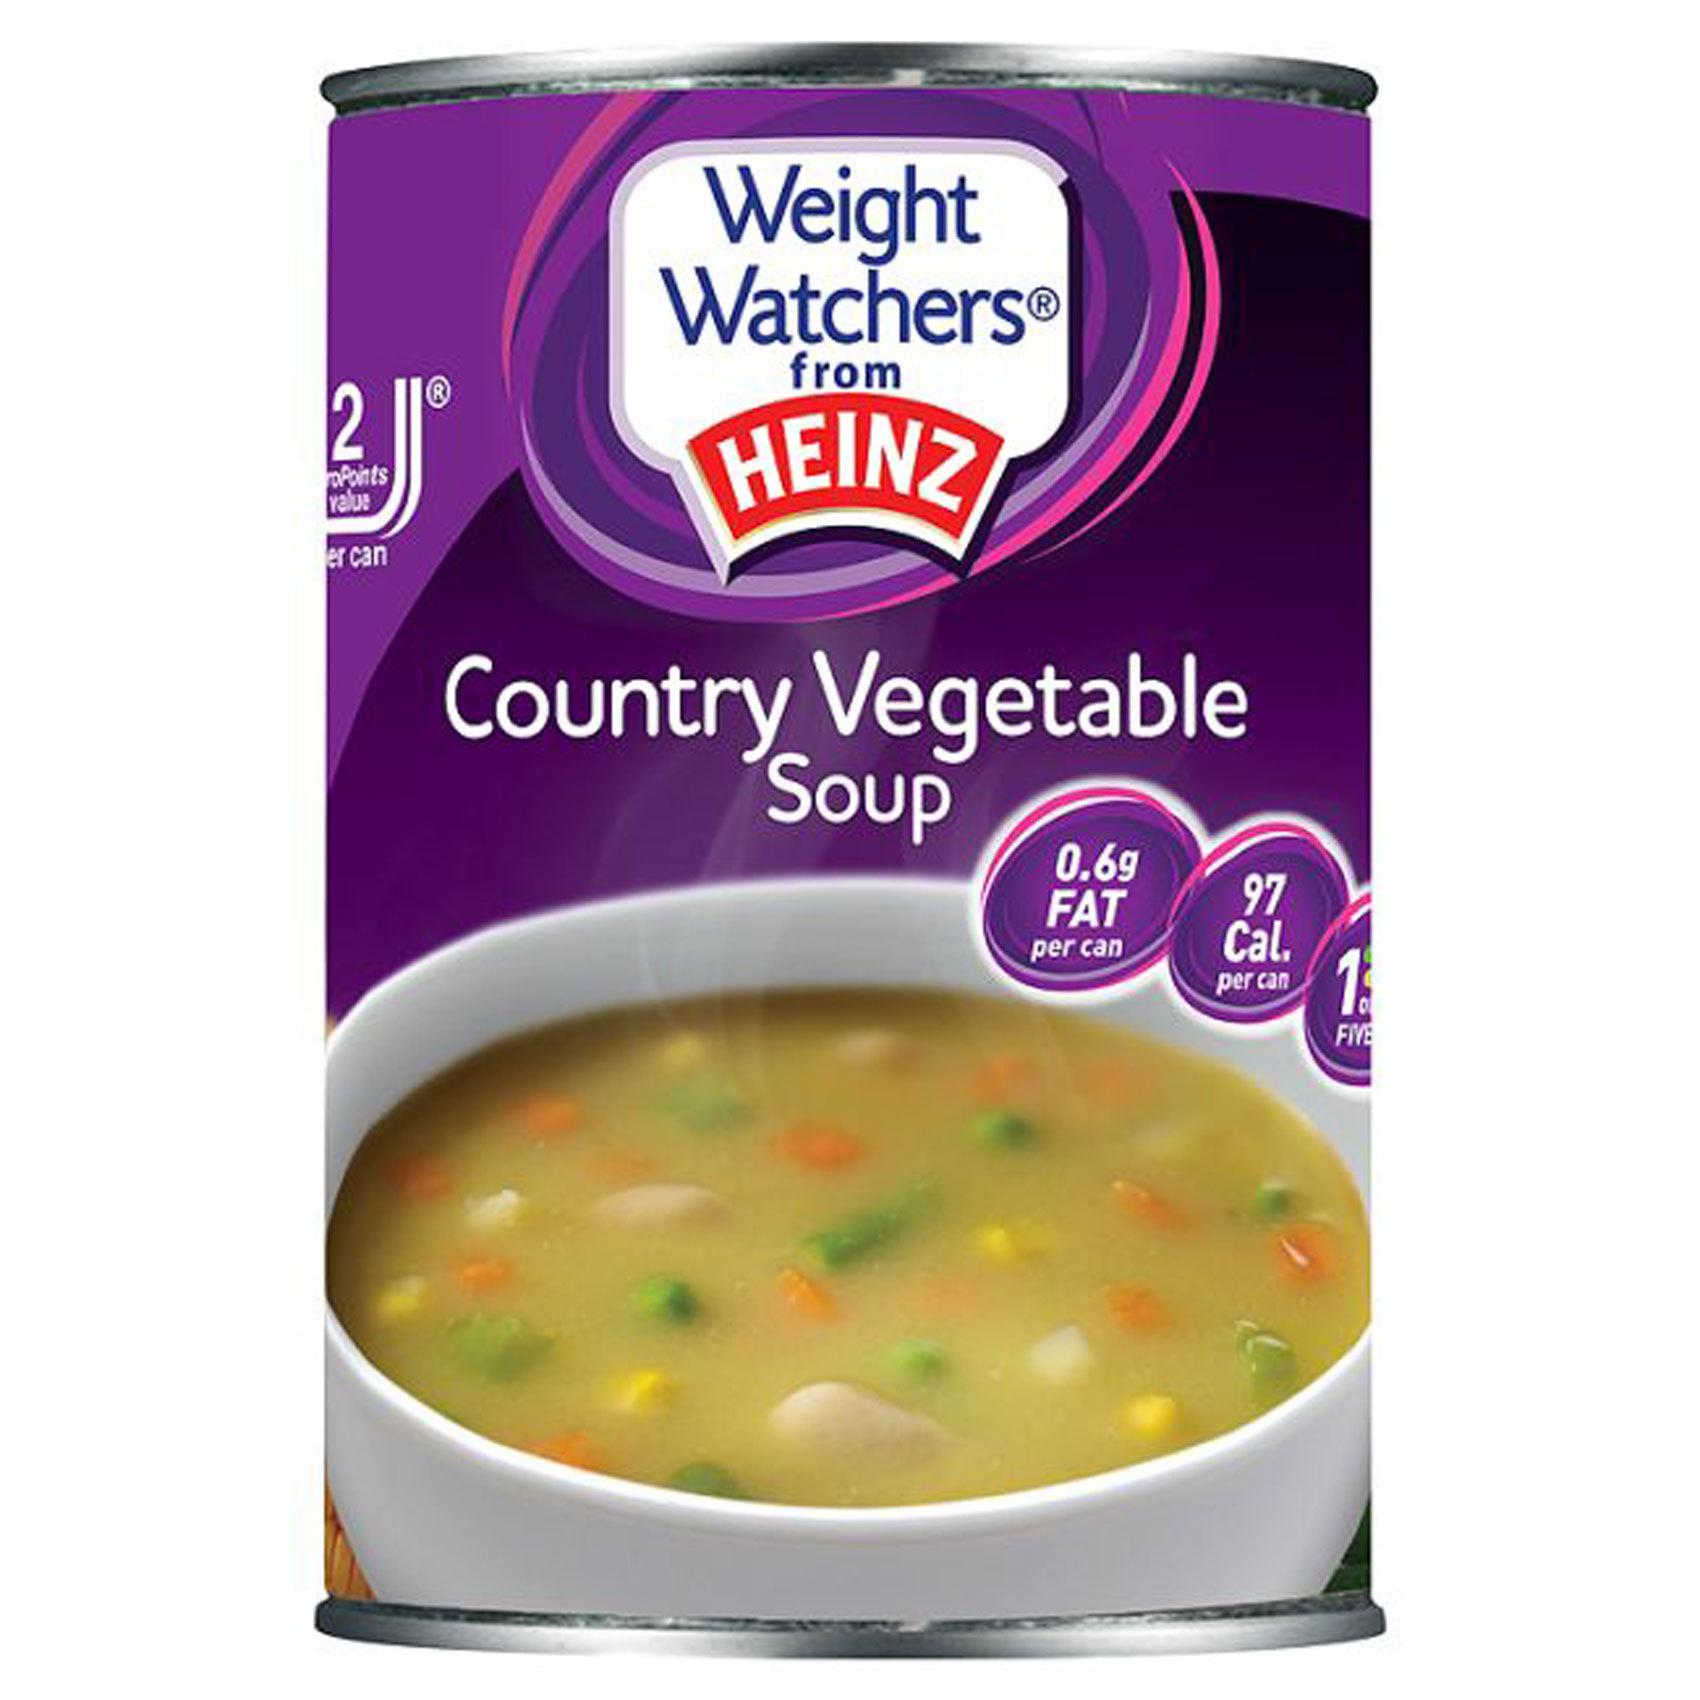 WEIGHT WATCHERS SOUP COUNTRY VEG 29